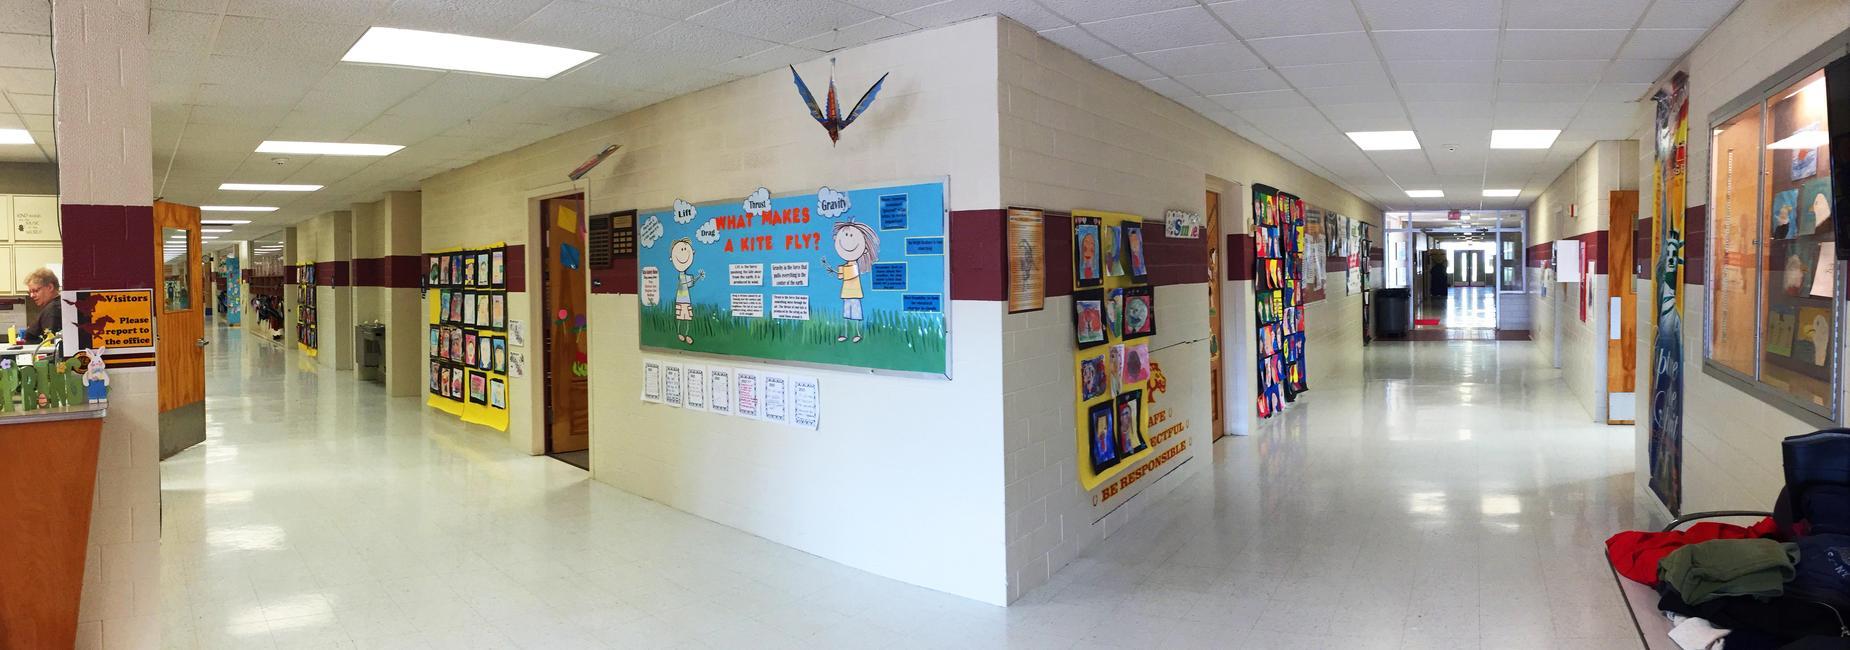 Monroe elementary hallway